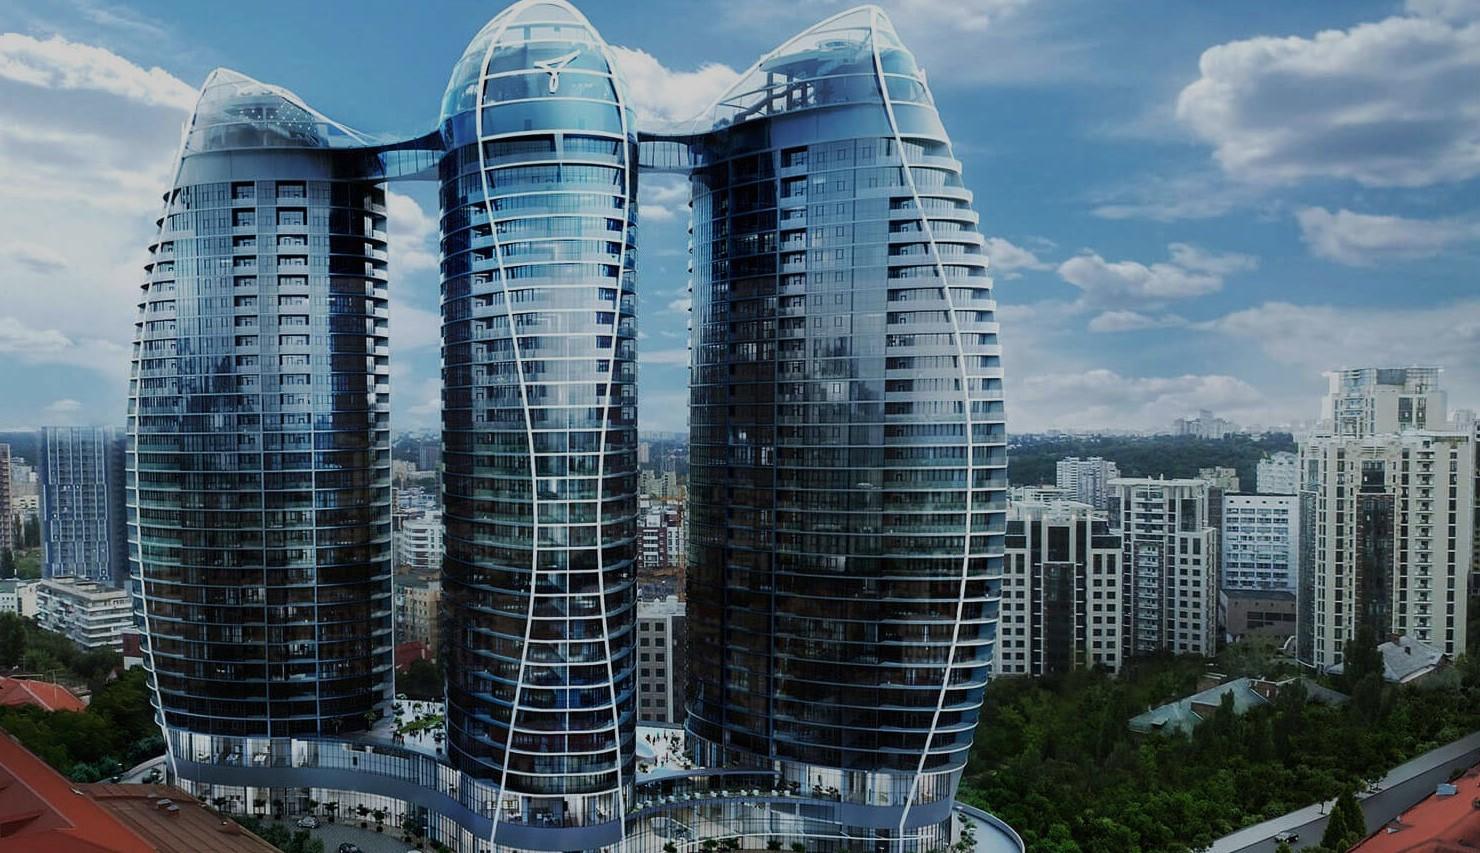 Башни Taryan Towers. Вежі Taryan Towers